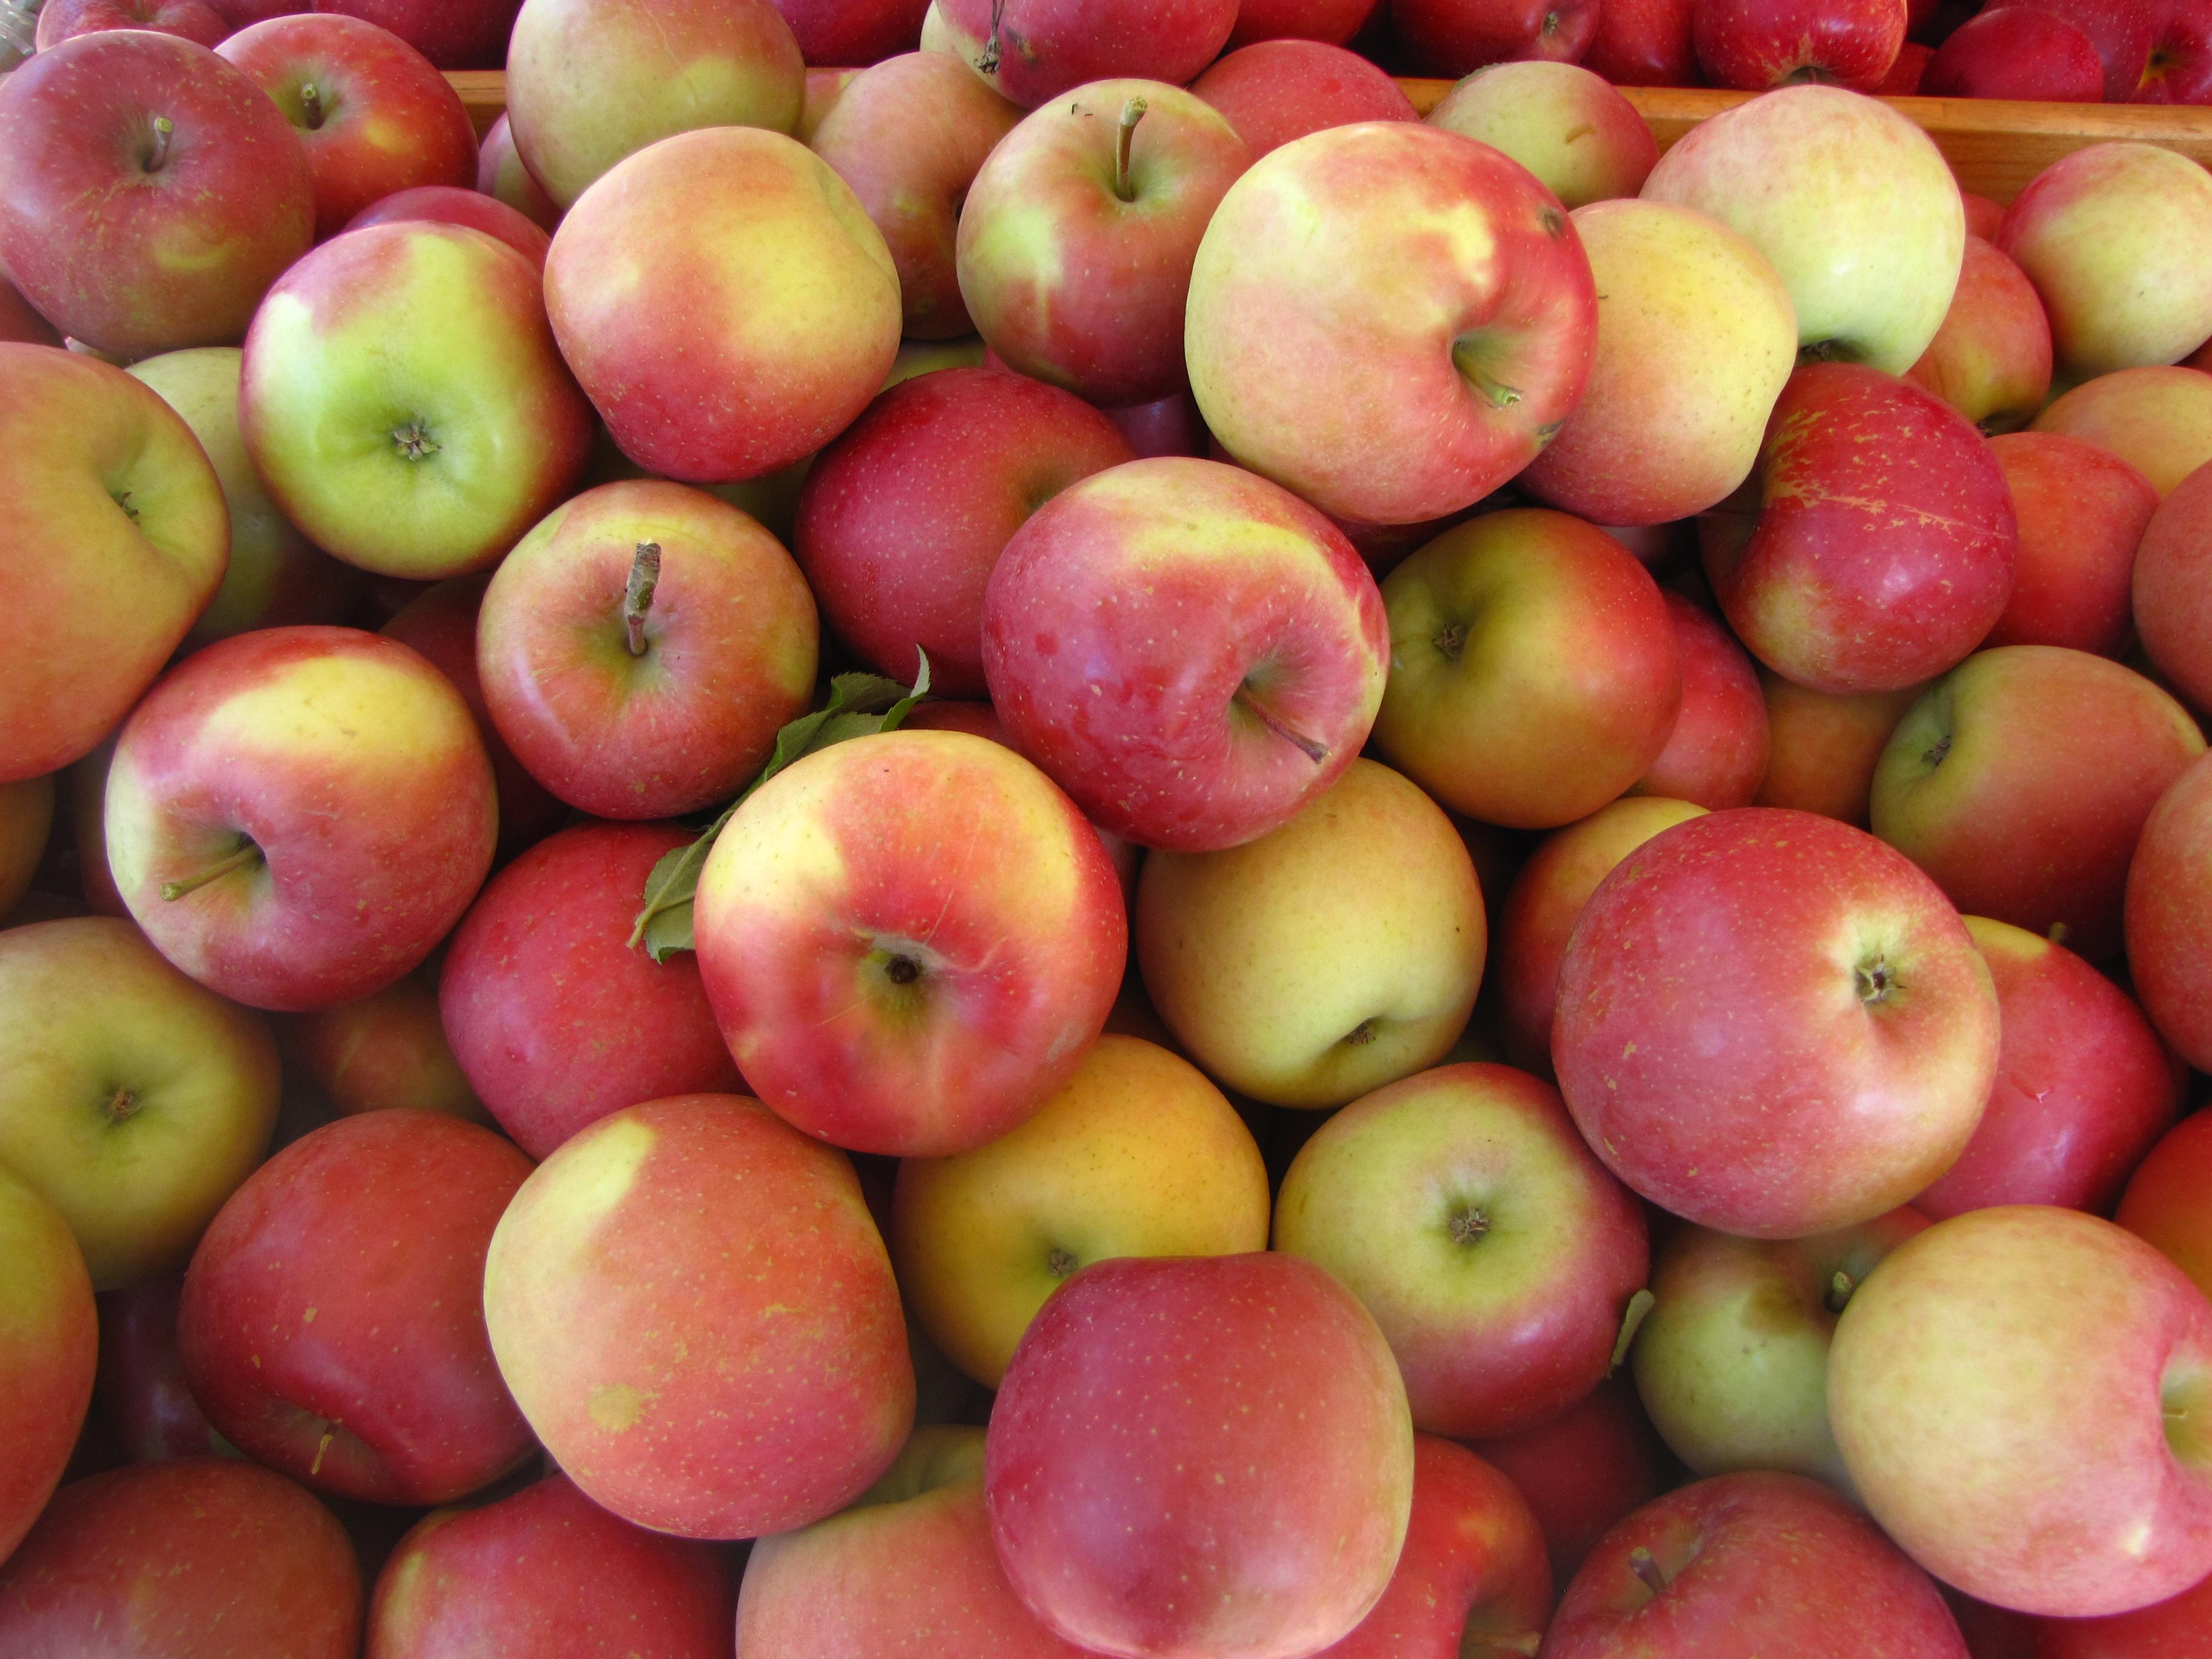 mcintosh apples.jpg